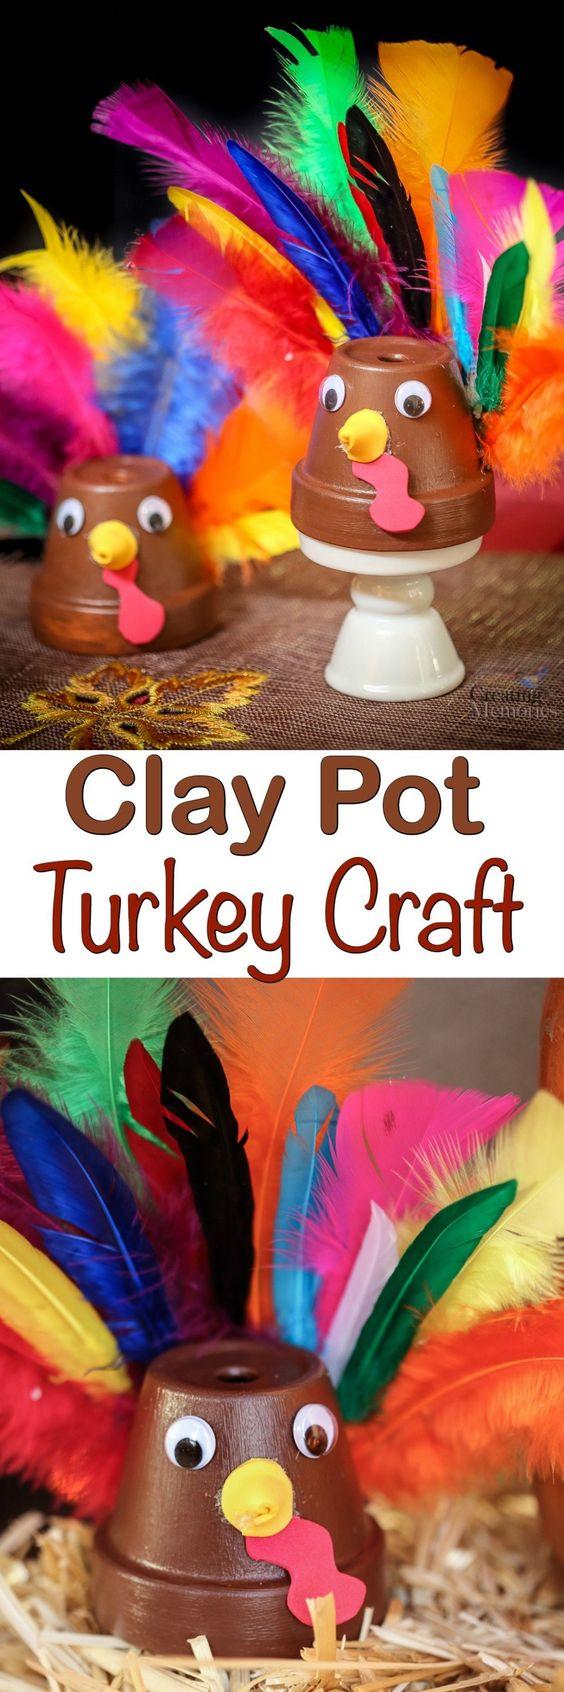 Easy Clay Pot Turkey Craft.